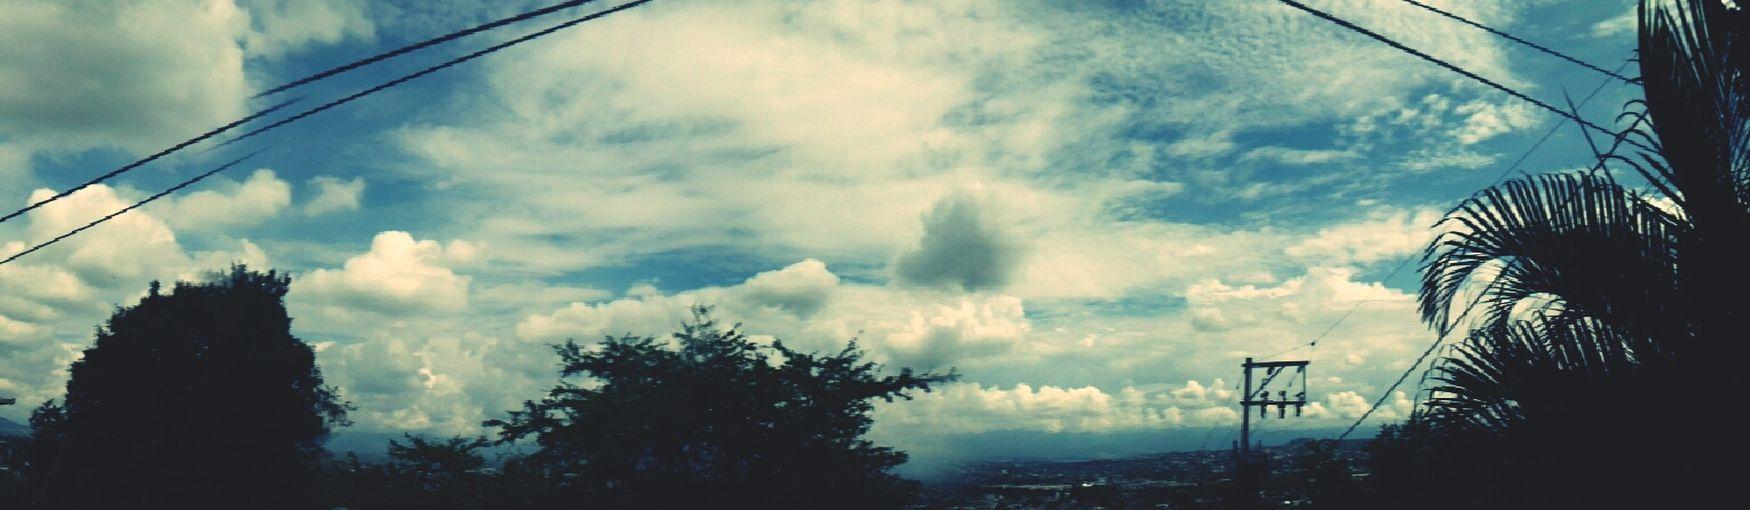 Landscape Landscape_captures First Eyeem Photo